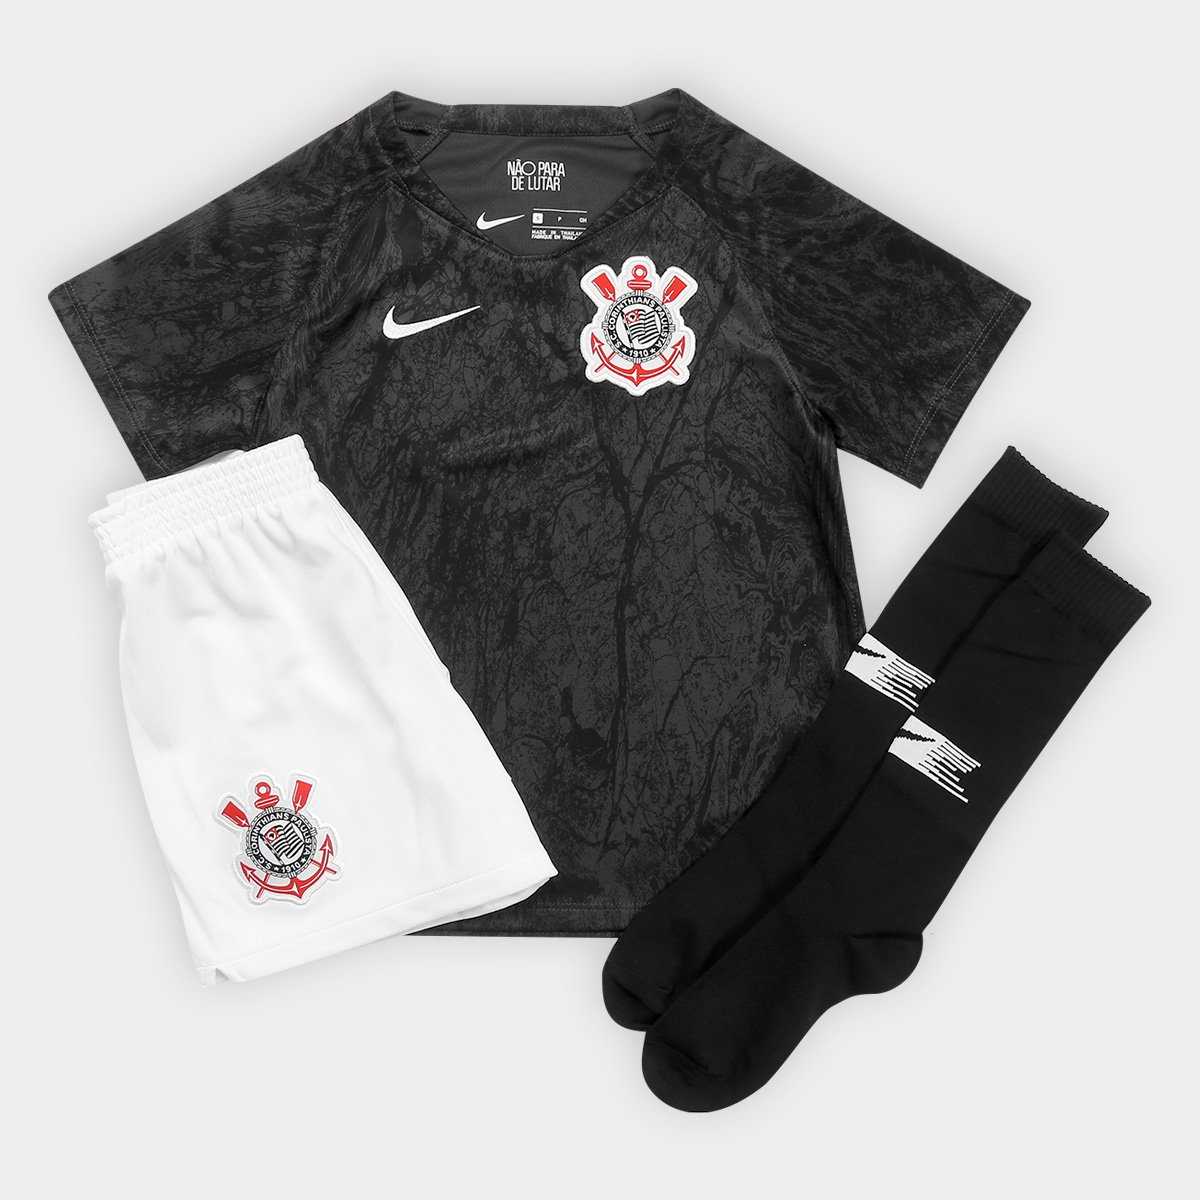 Kit Corinthians Infantil II 2018 s n° Torcedor Nike - Compre Agora ... ea7f7aa16659d